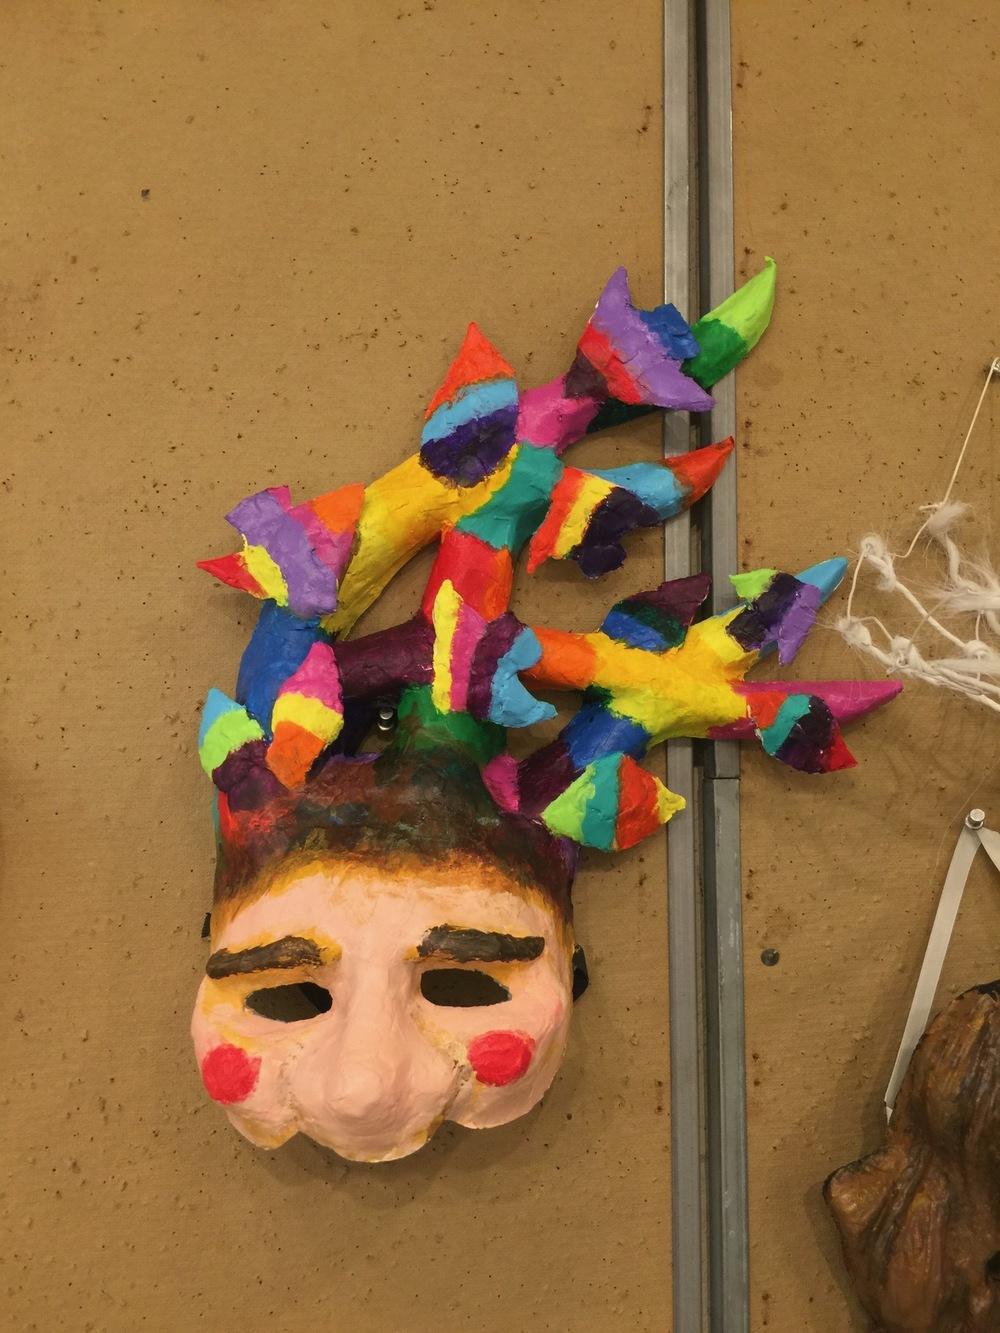 Ariel Wang - The Magic Flute Papageno Mask, Paper Mache